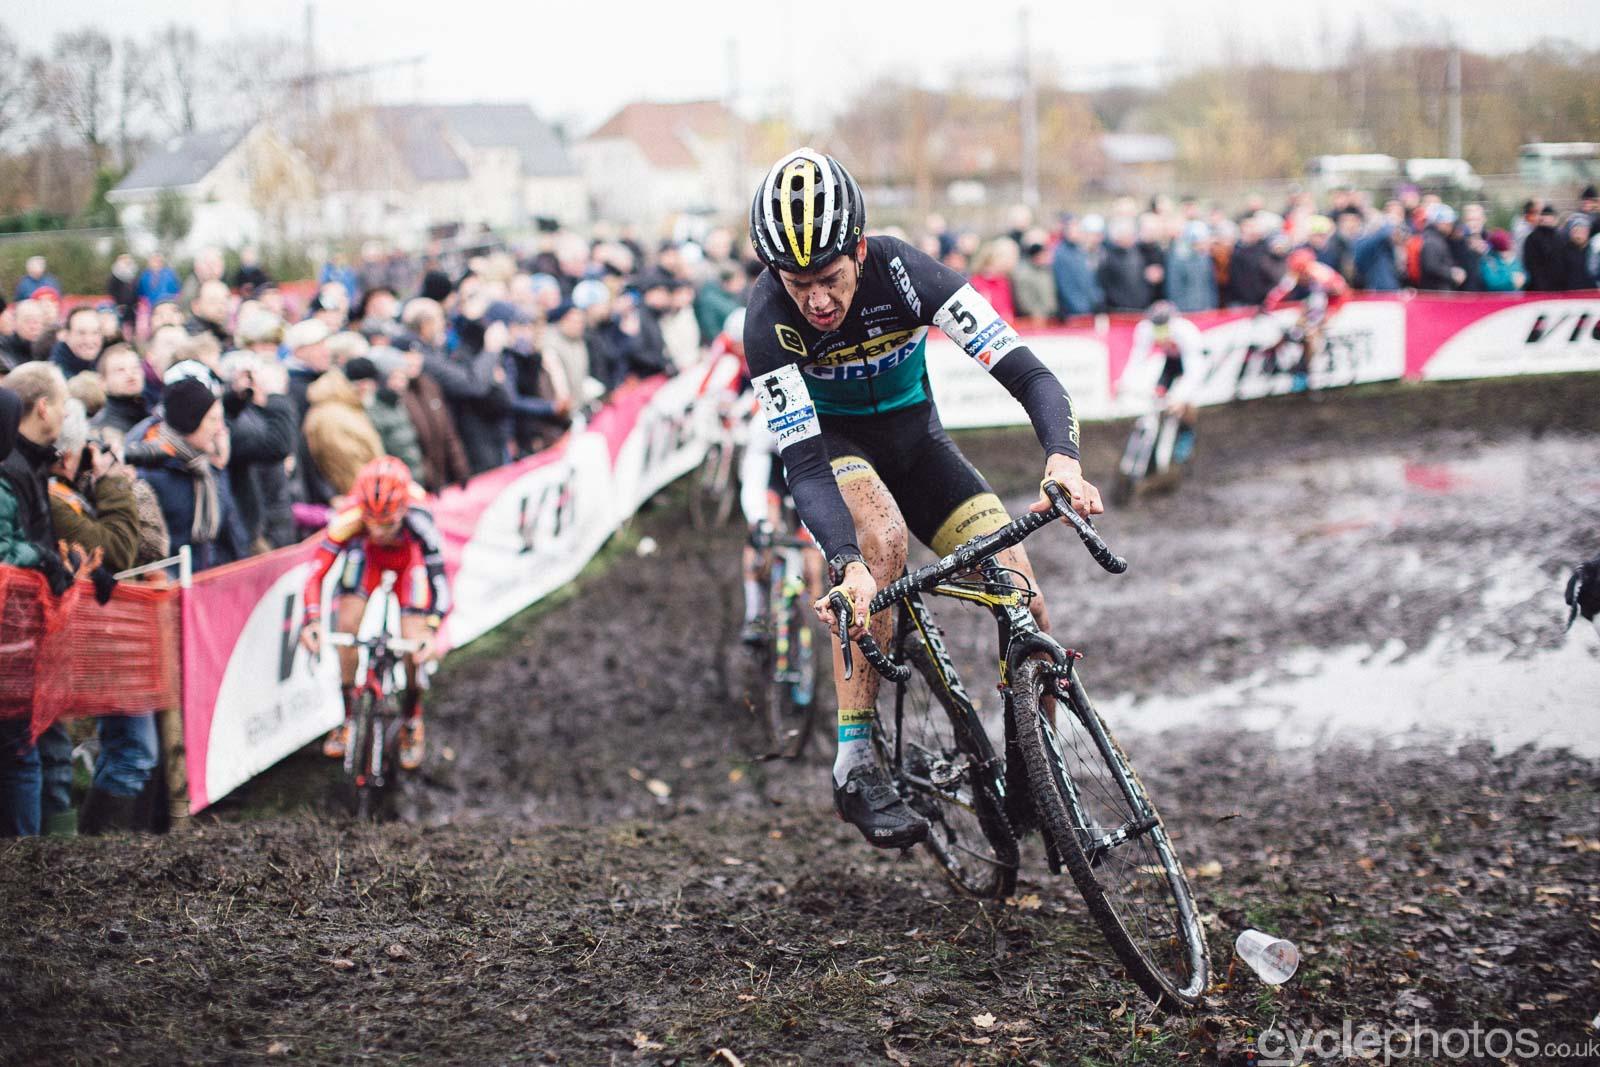 2015-cyclephotos-cyclocross-essen-150623-tom-meeusen